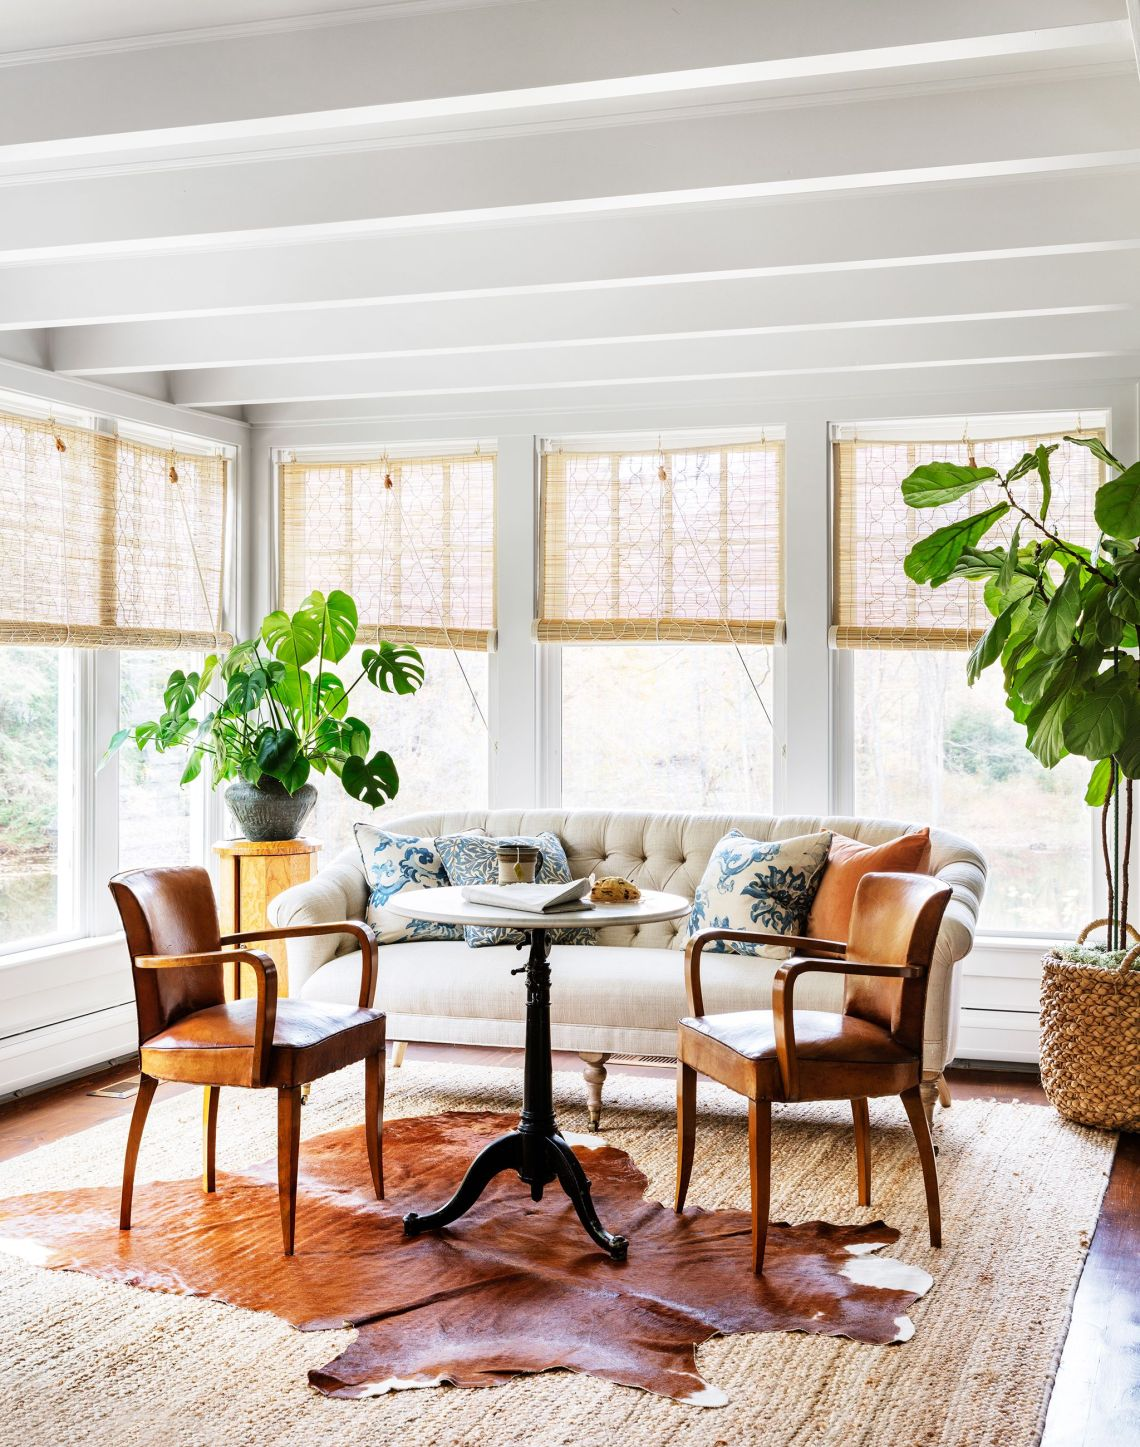 26 Sunroom Decorating Ideas Best Designs For Sun Rooms